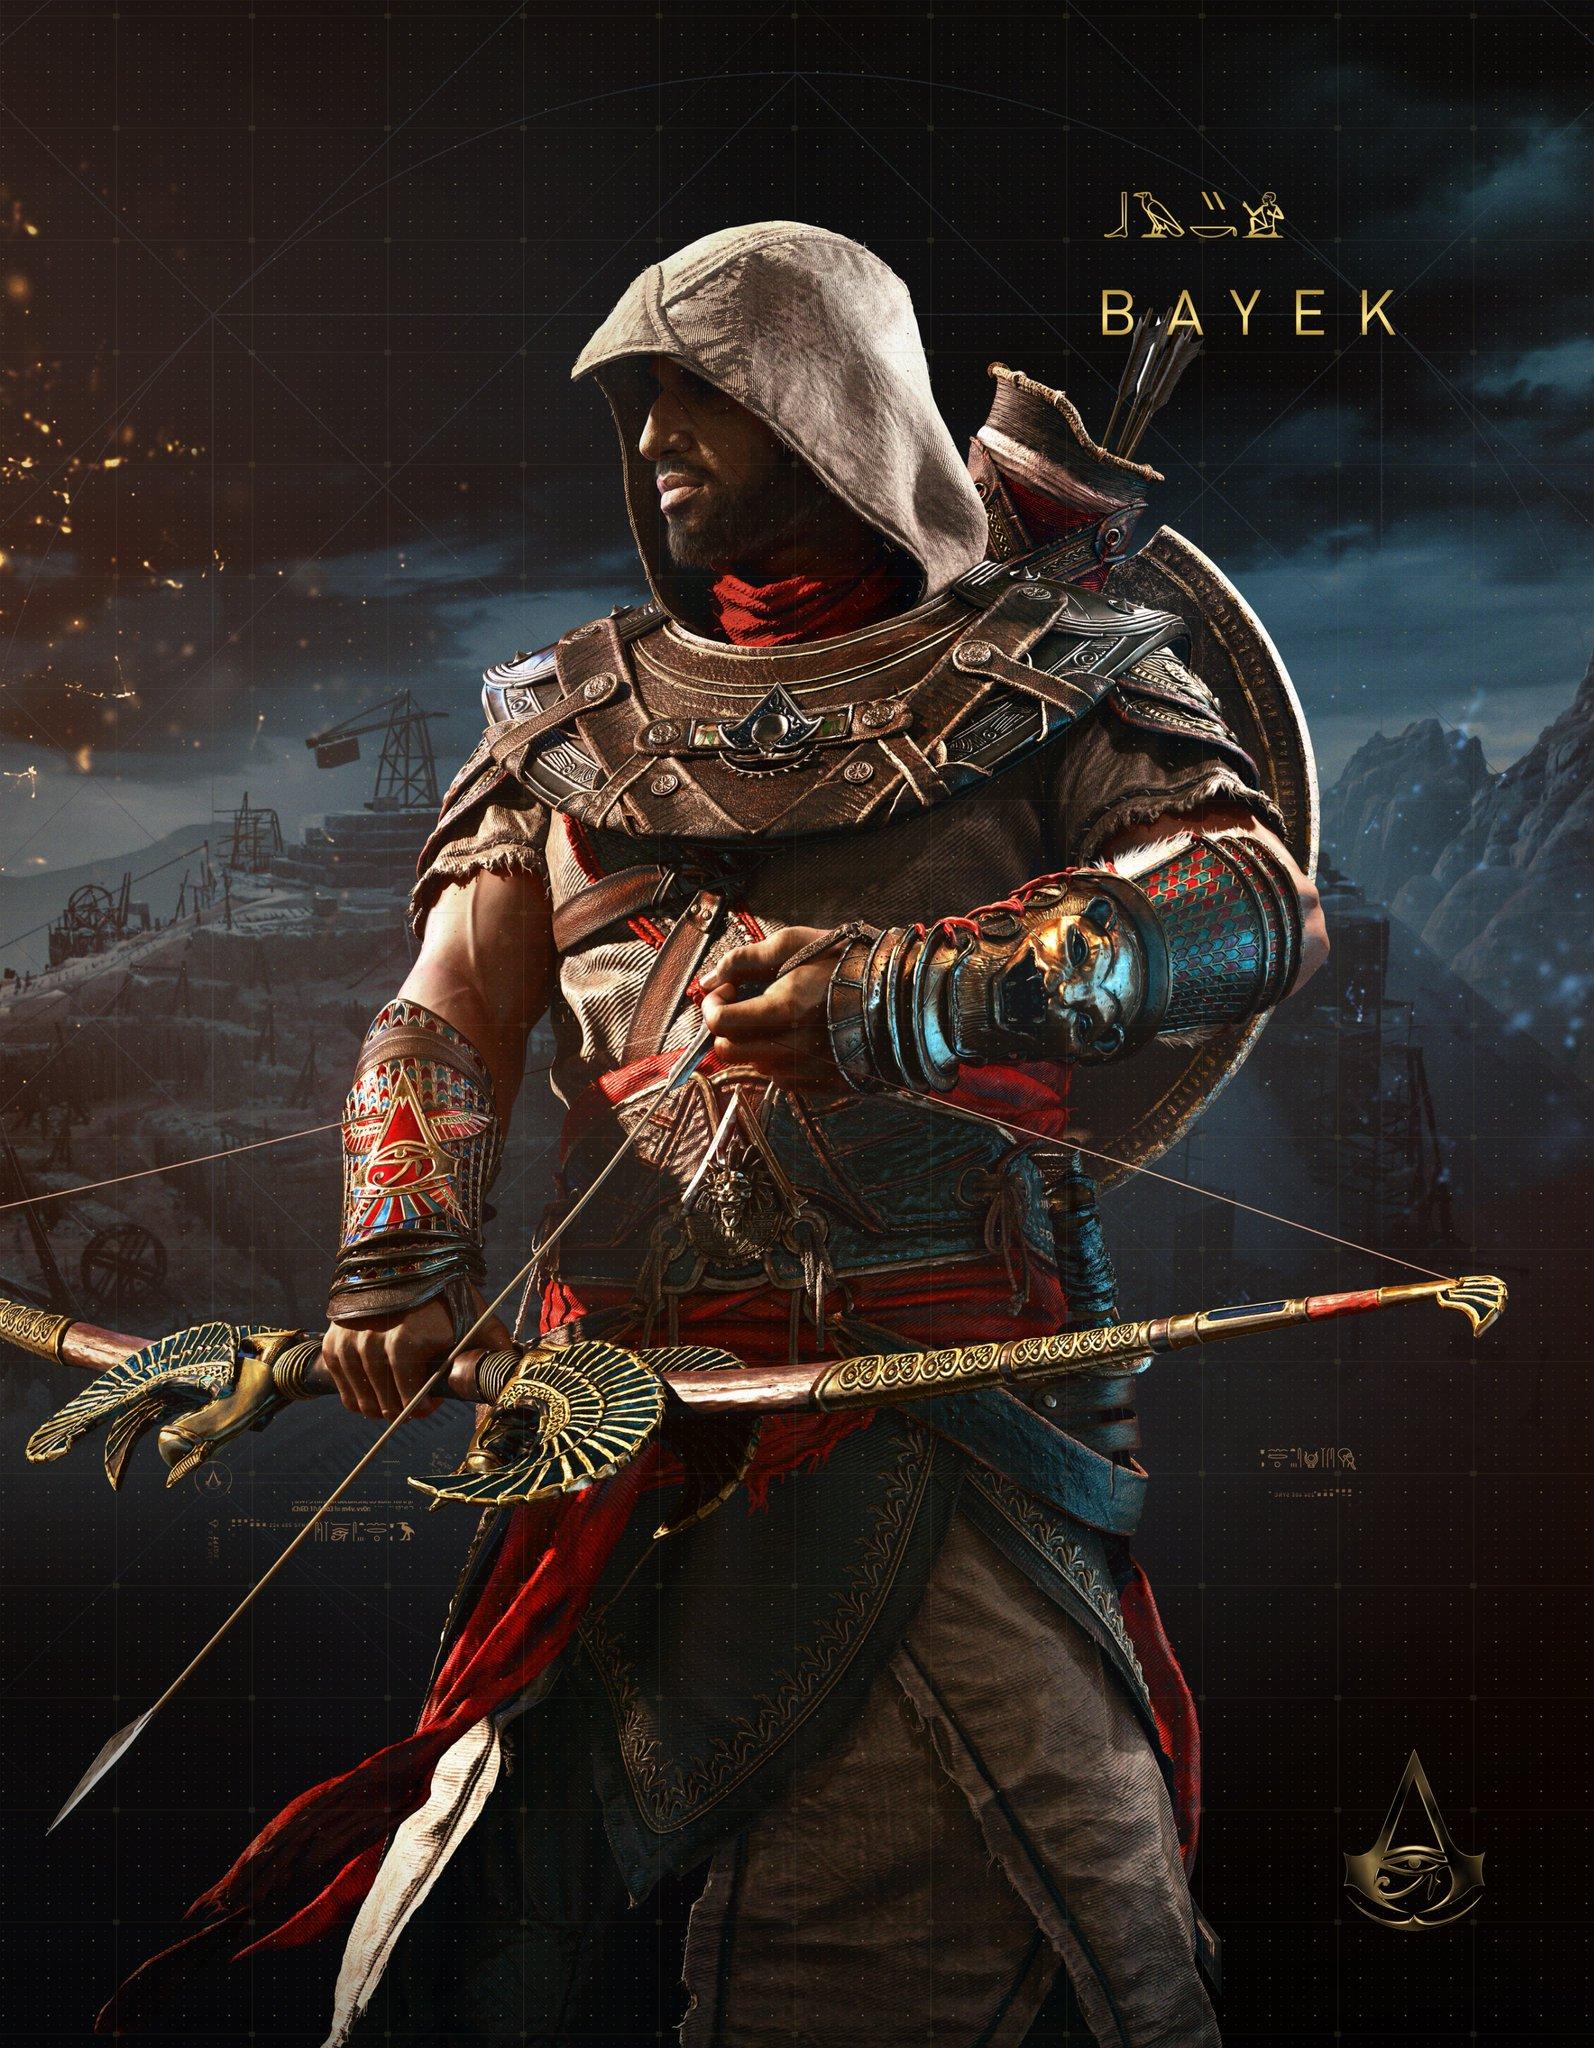 Assassin's Creed: Origins - Bayek - Assassin's Creed: Origins Арт